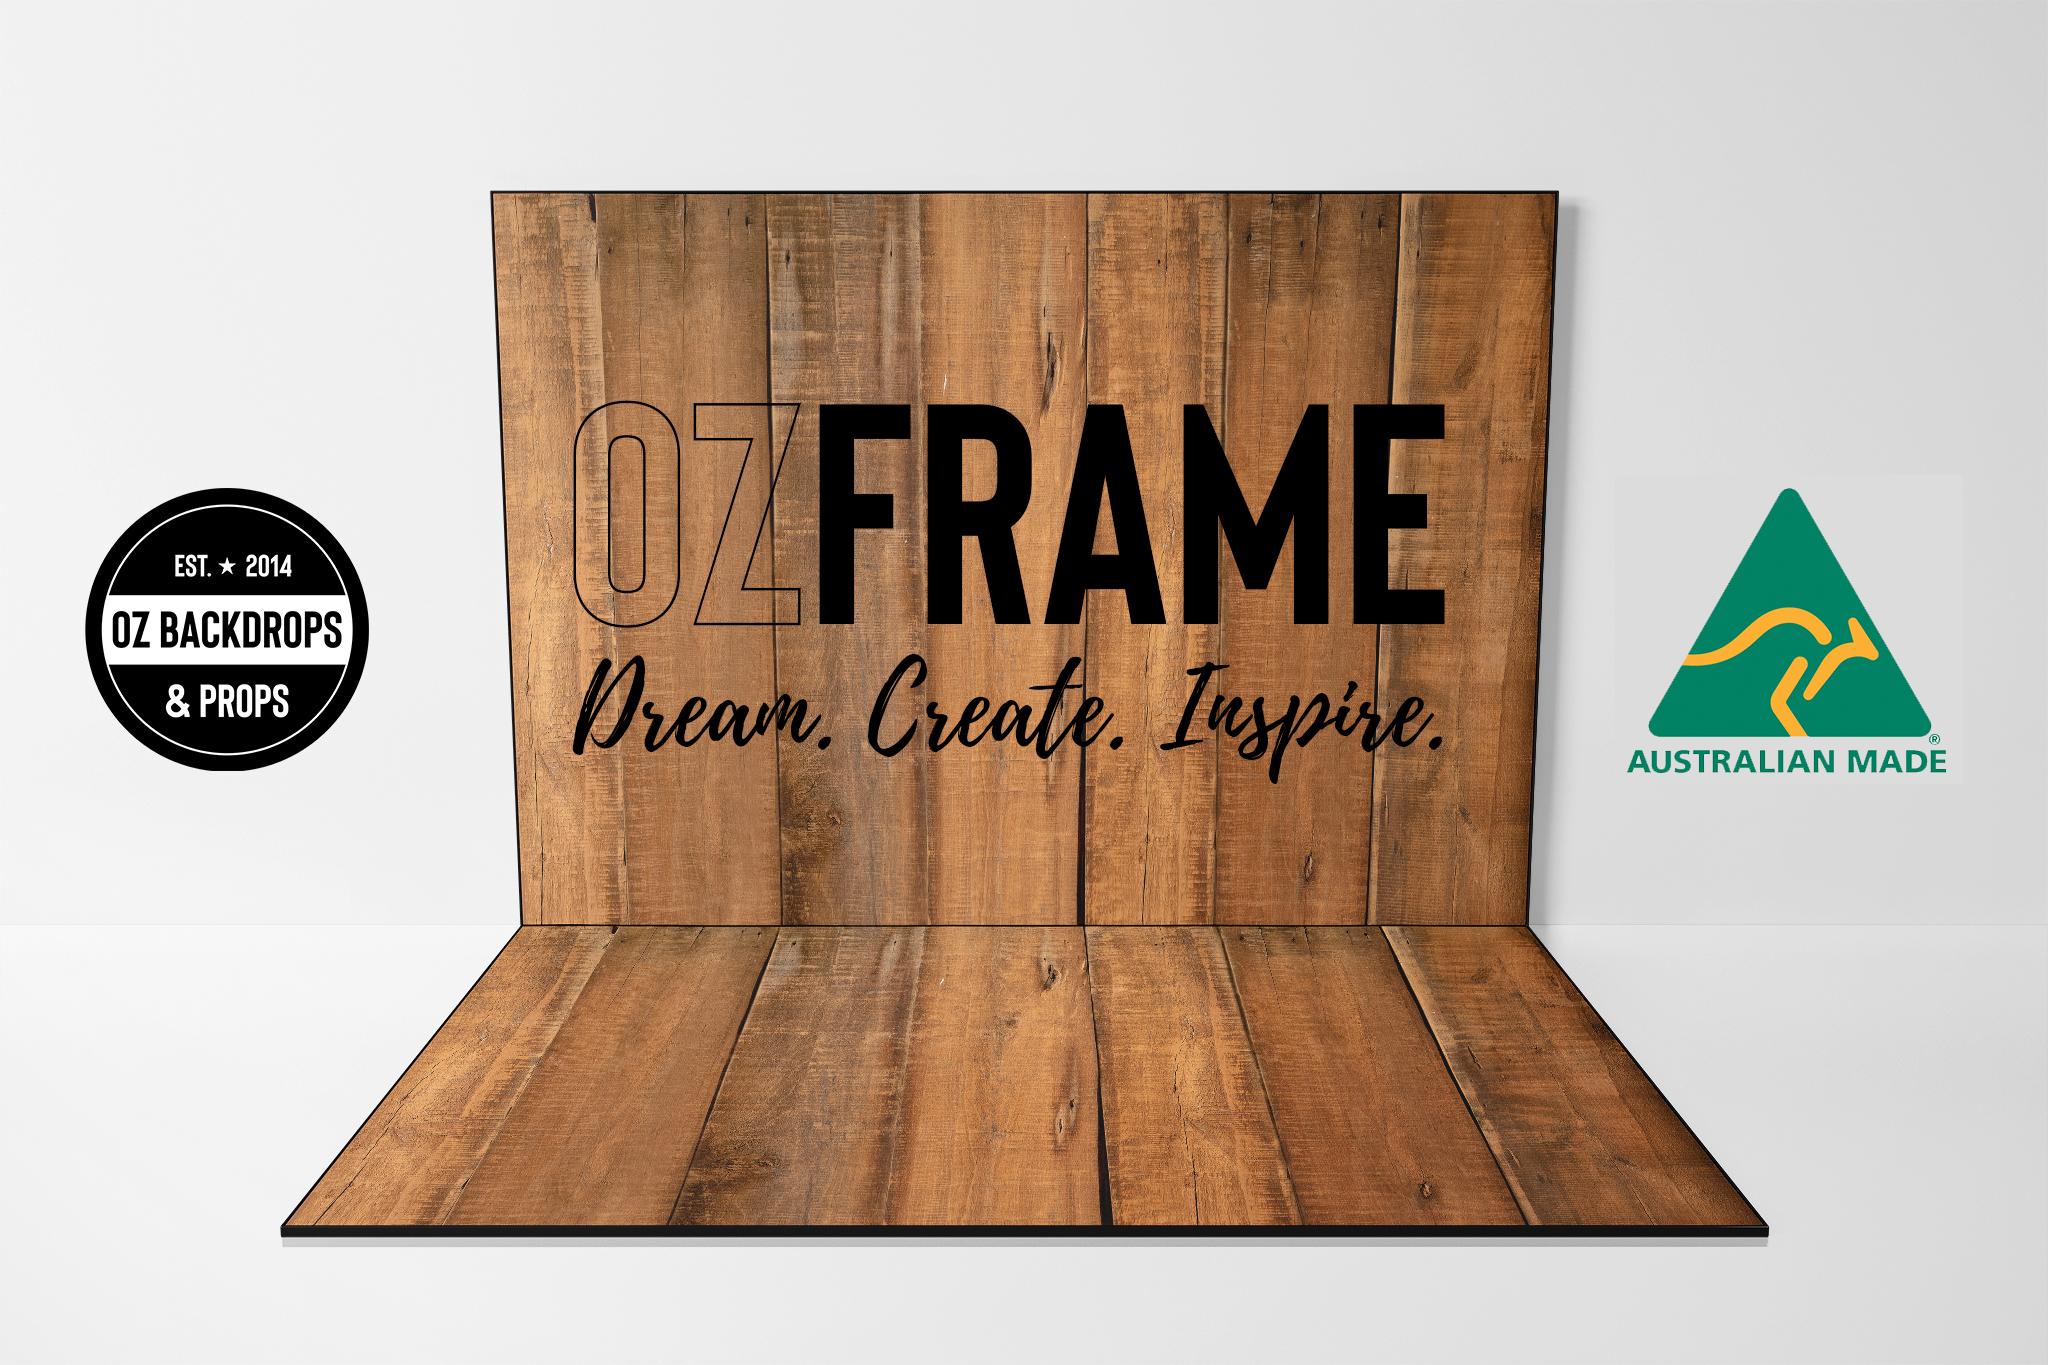 OzFrame - Dream. Create. Inspire.